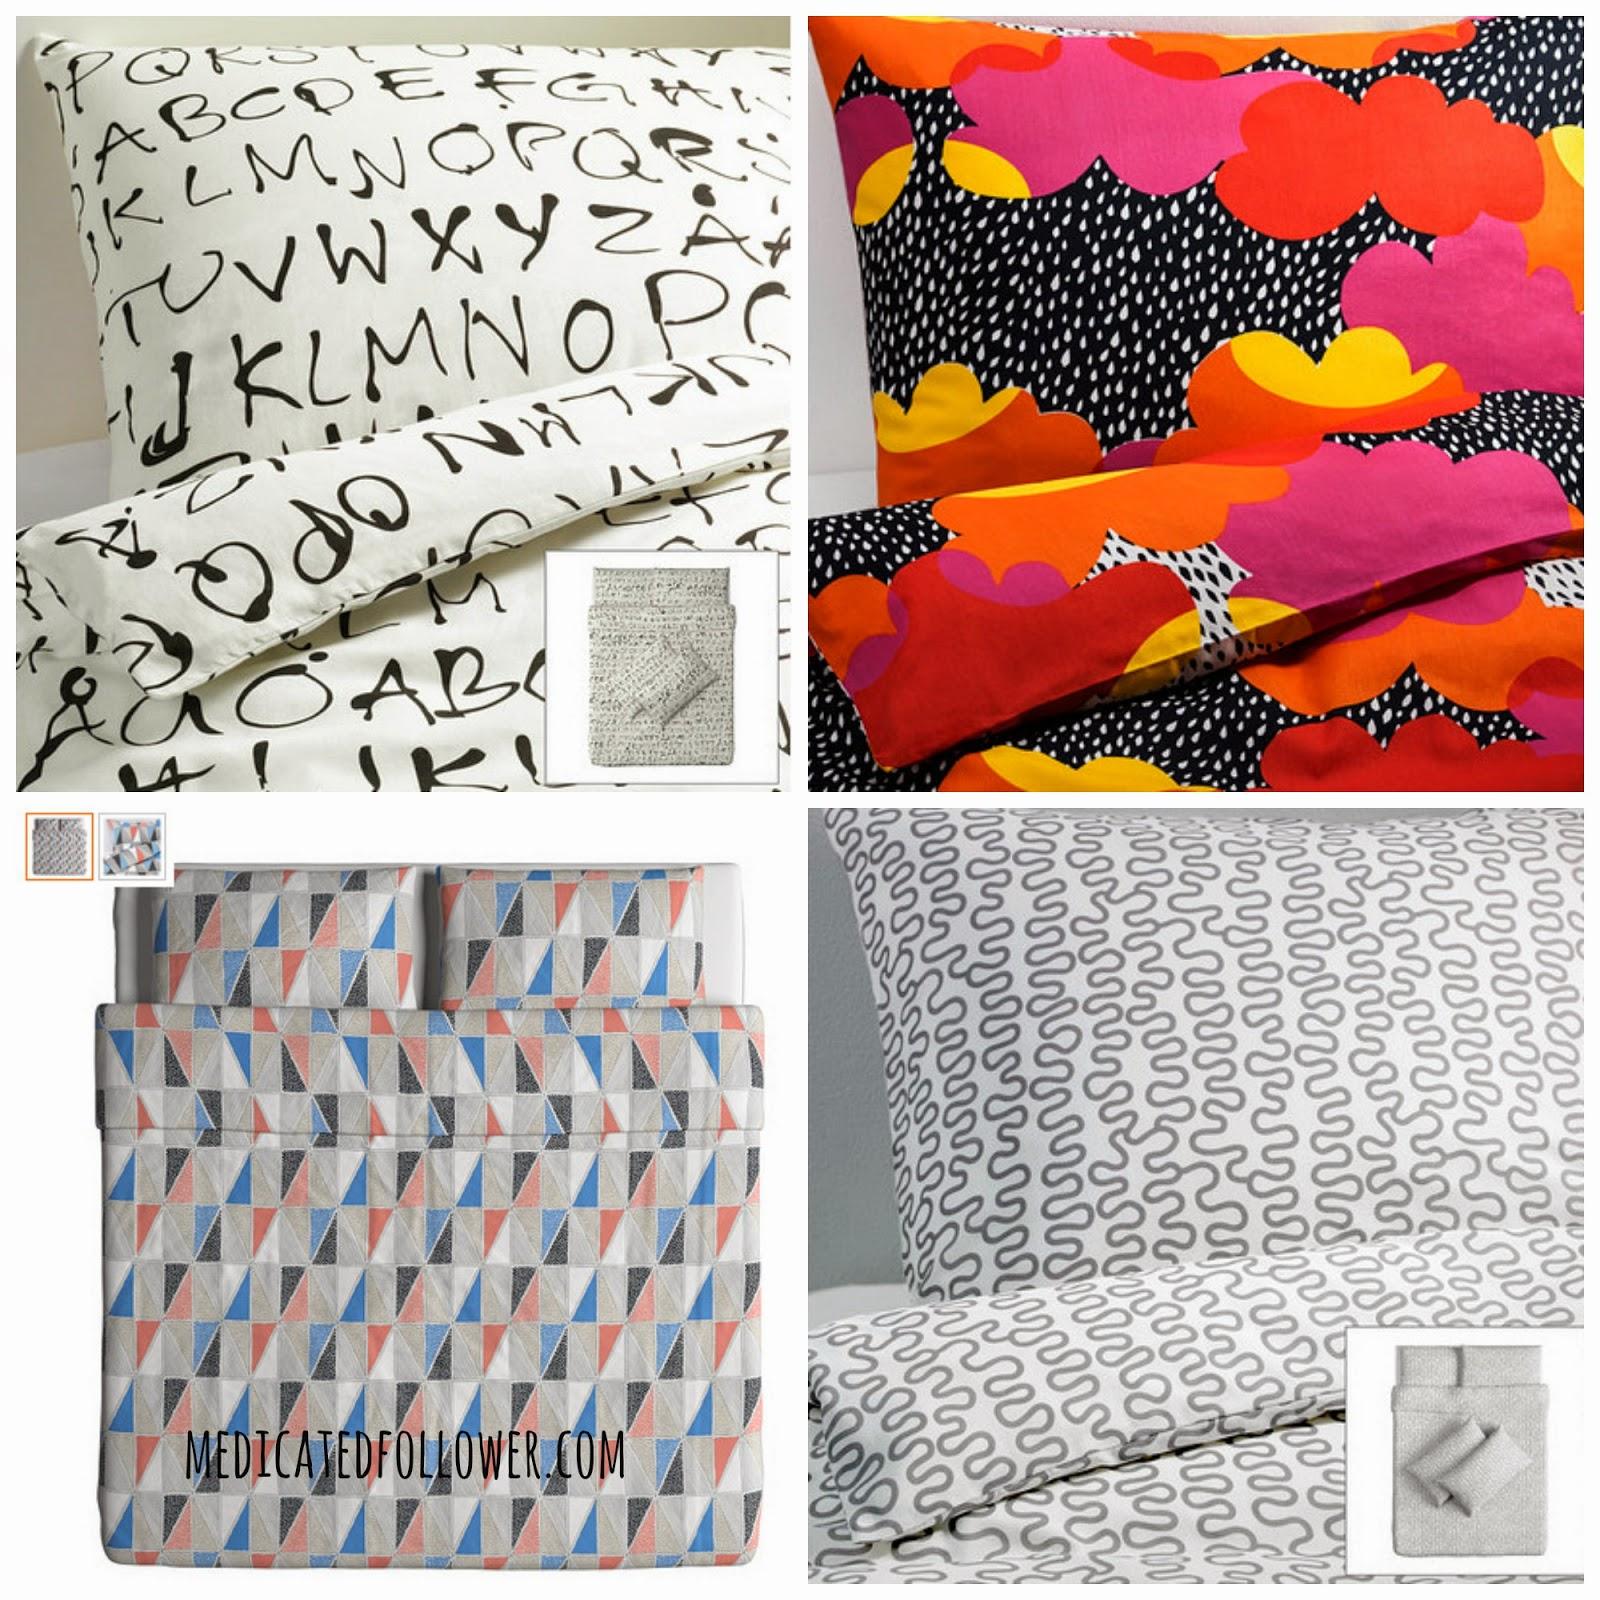 Ikea bedding covers.  Monochrome. Geometric. Medicated Follower of Fashion.  Bedding.